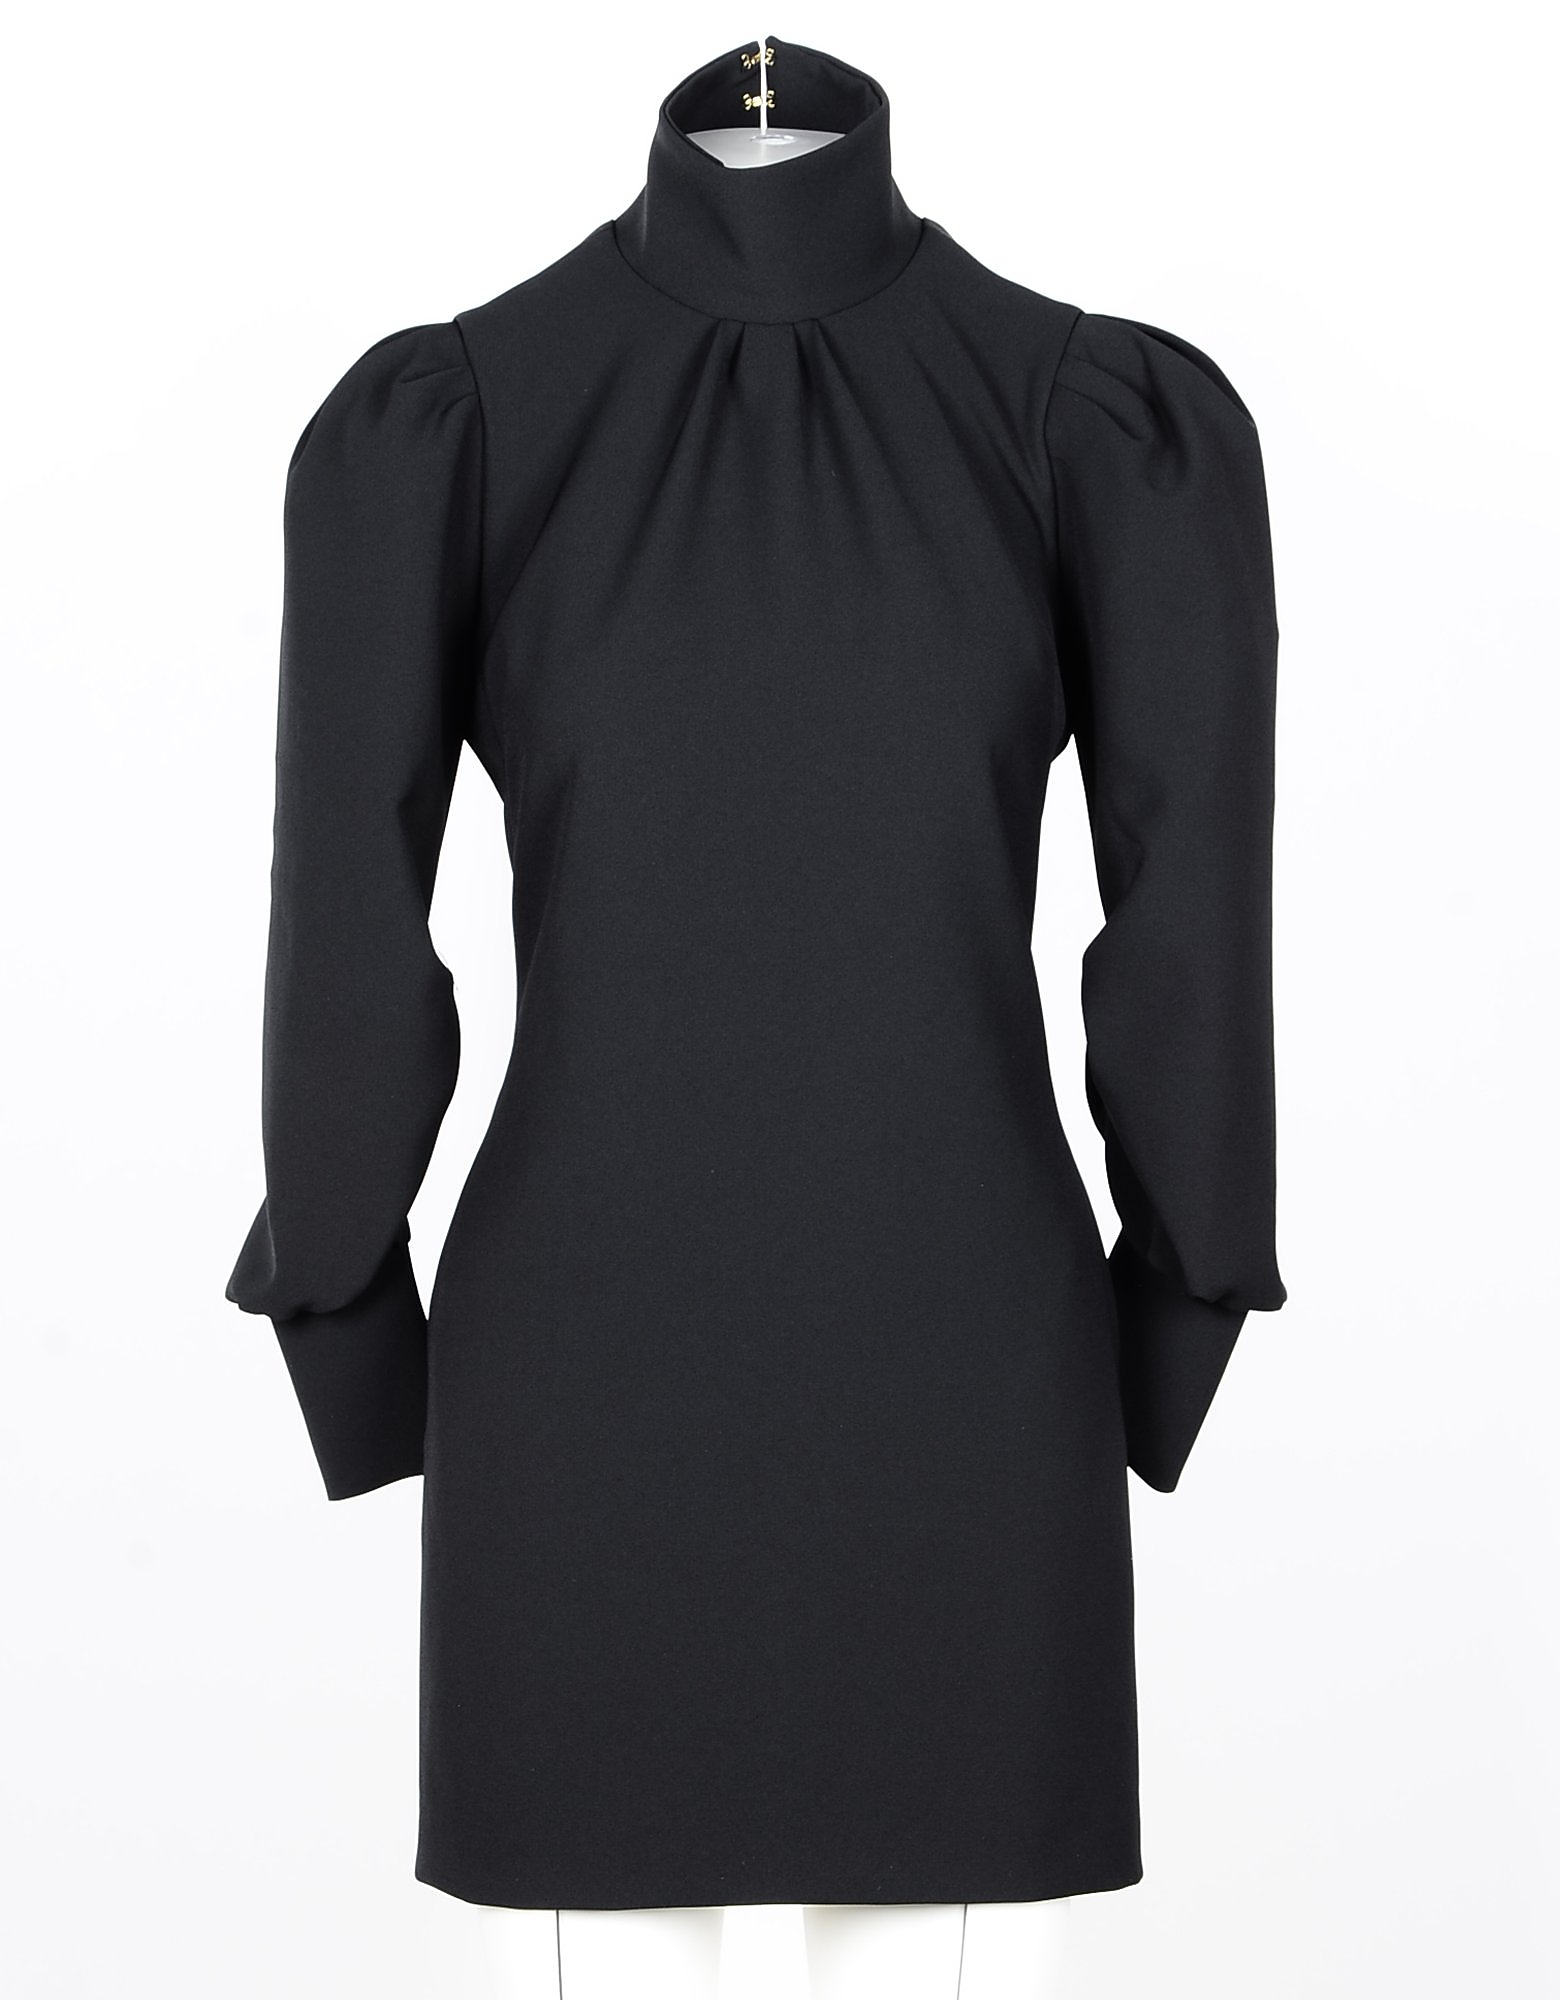 Marco Bologna 连衣裙、连衣裤, Black Open Back Women's Mini Dress w